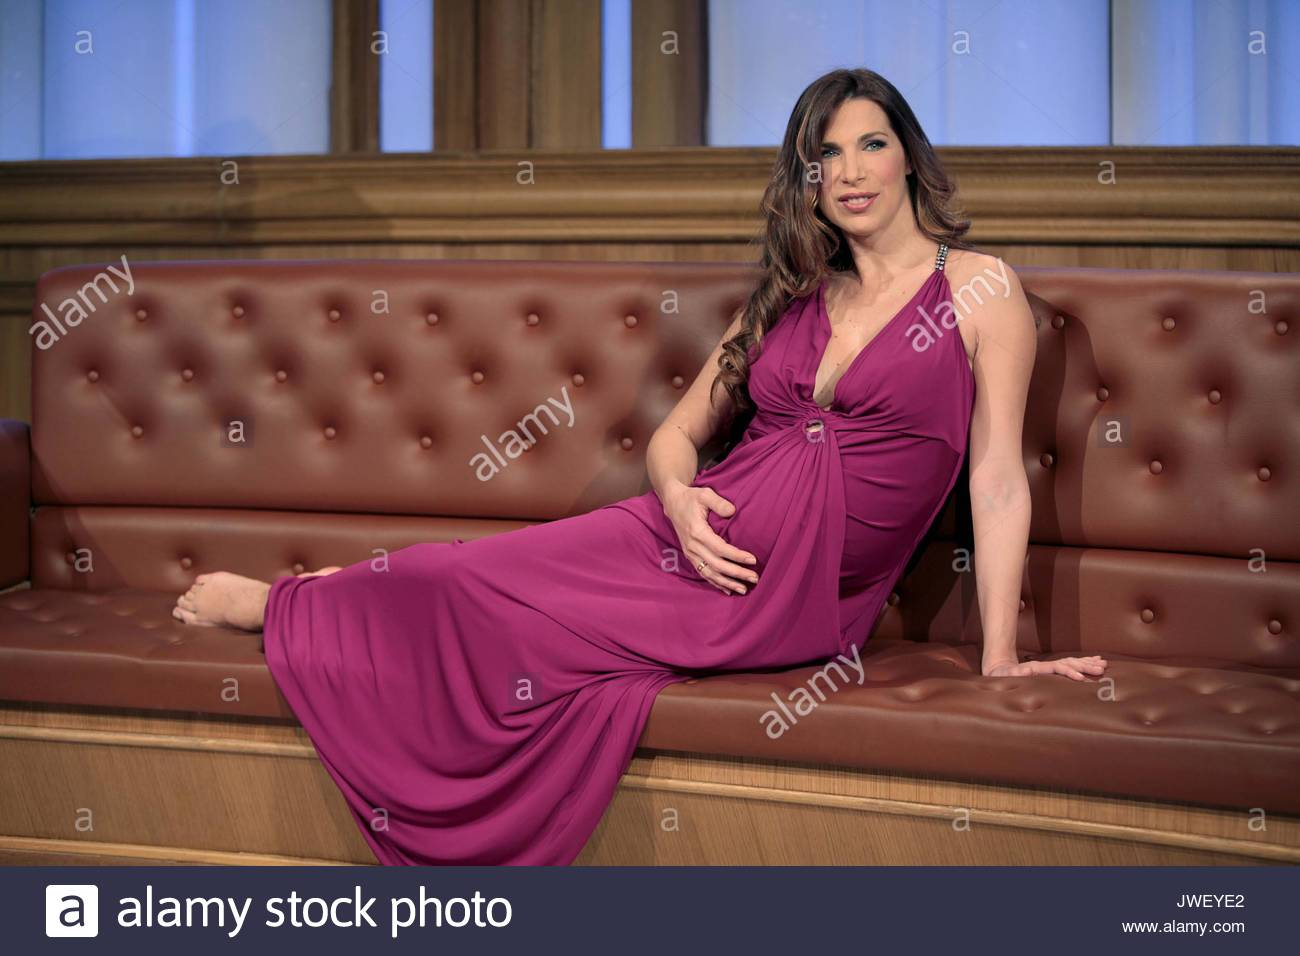 Celebrites Veronica Maya nude photos 2019